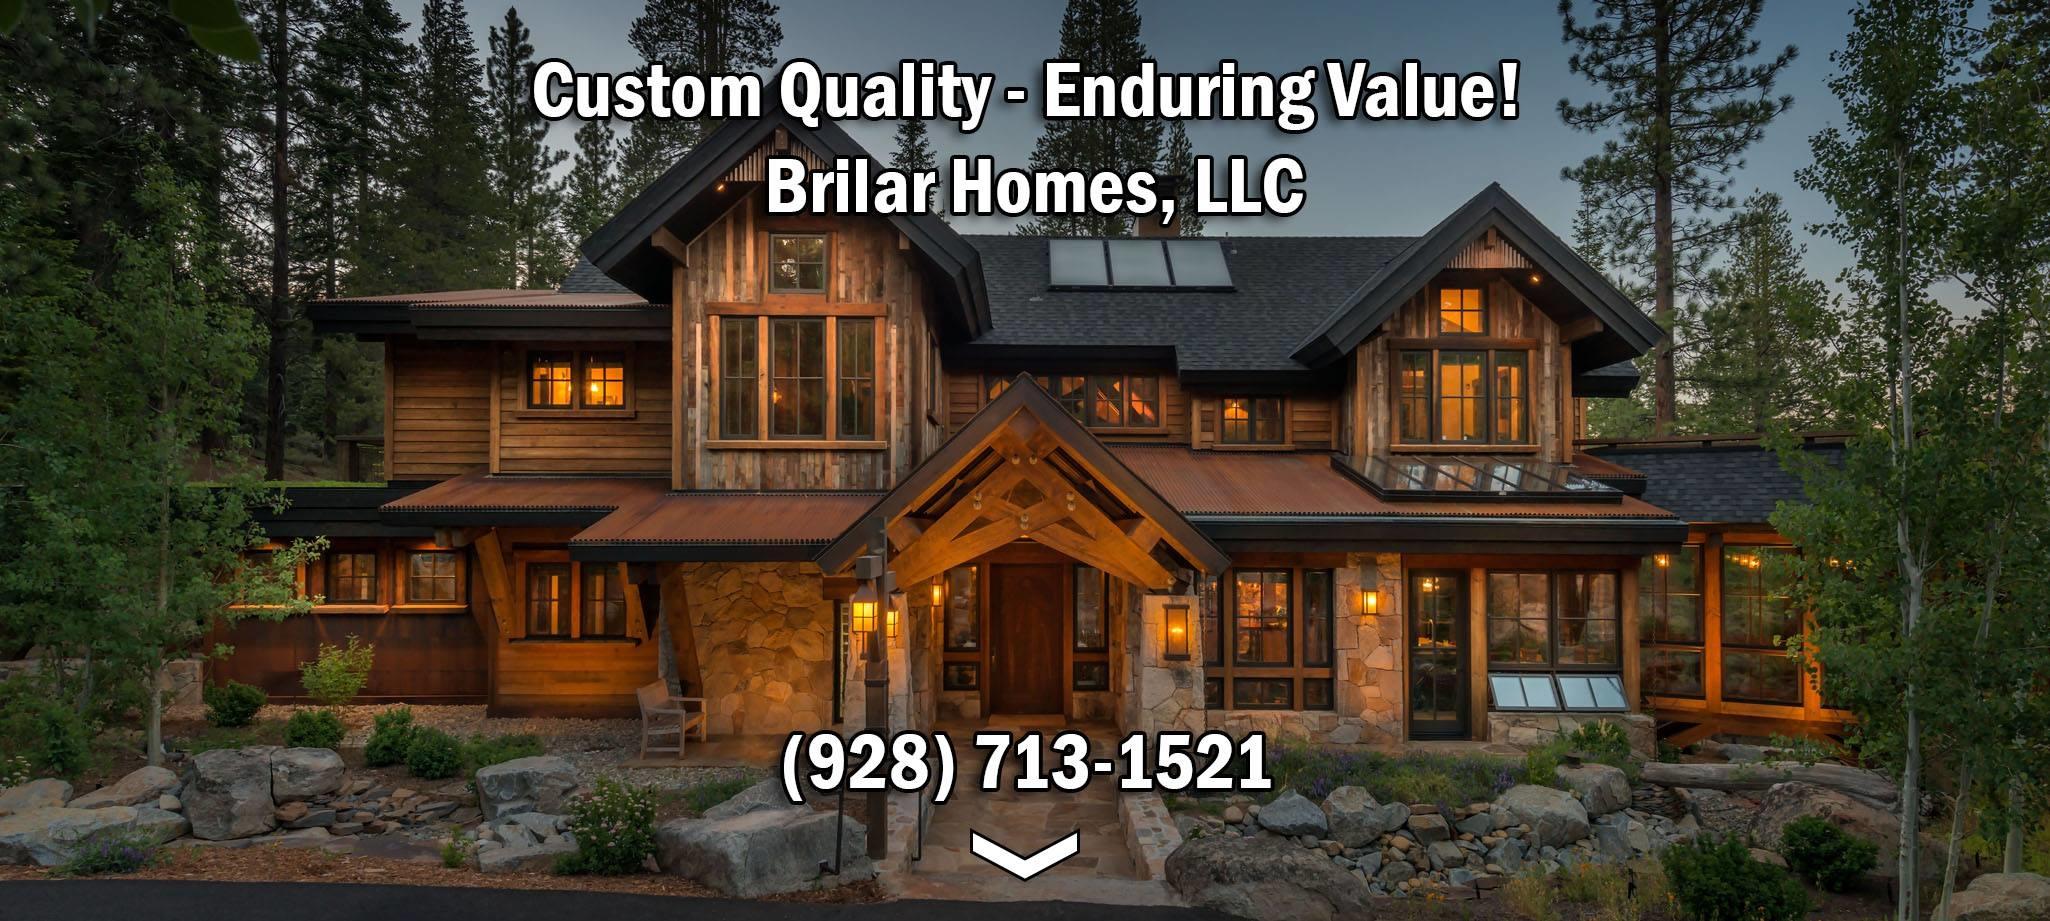 Brilar Homes LLC image 3